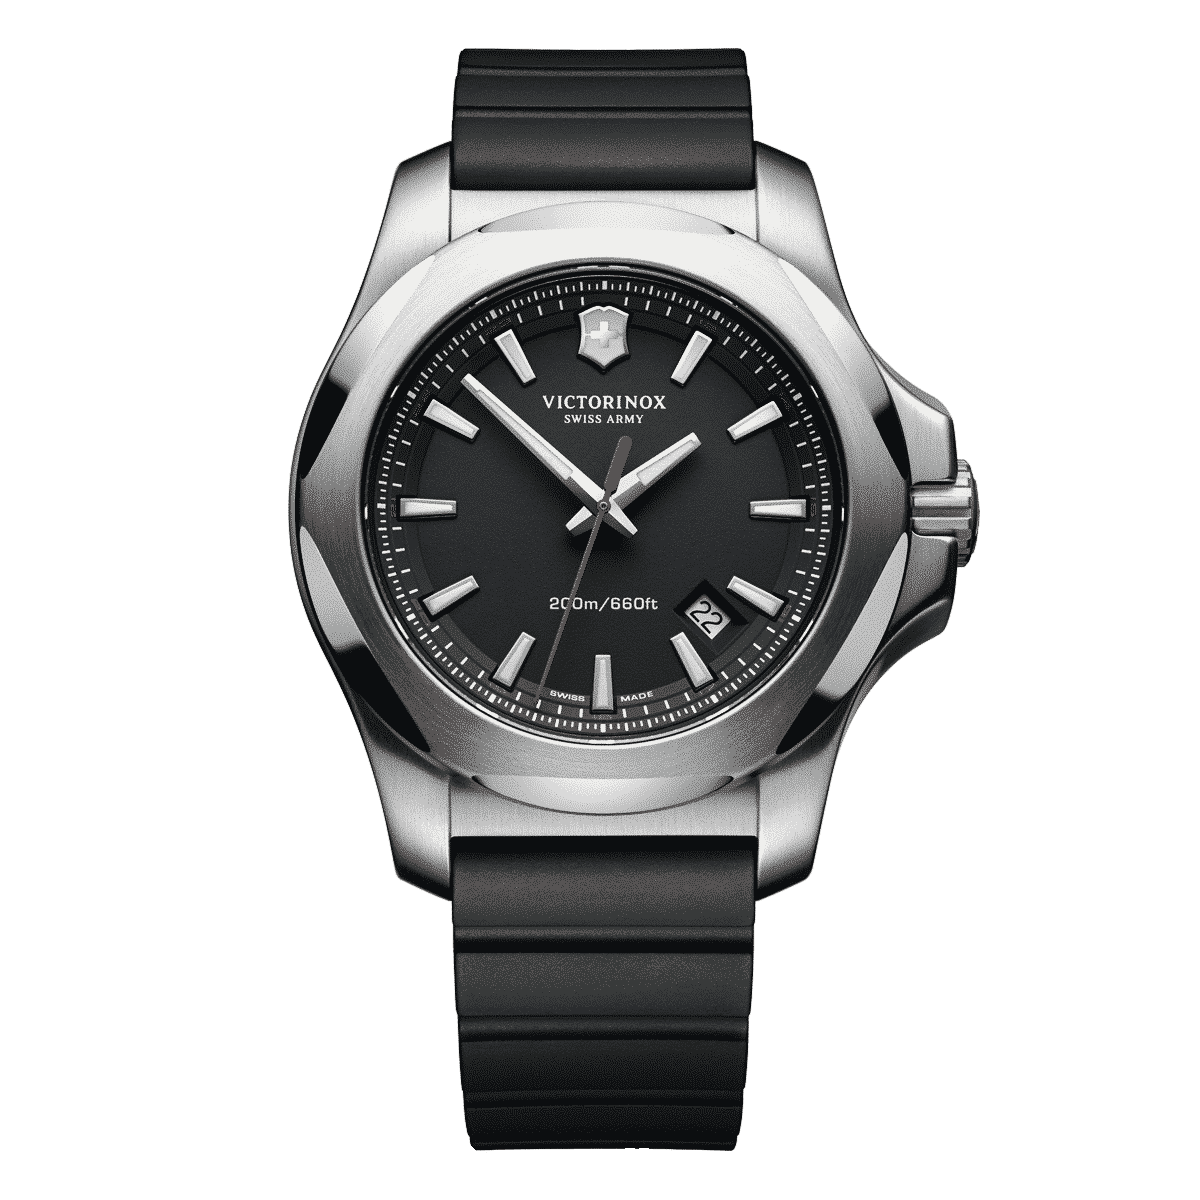 Victorinox-I.N.O.X-241682 Lionel Meylan Horlogerie Joaillerie Vevey